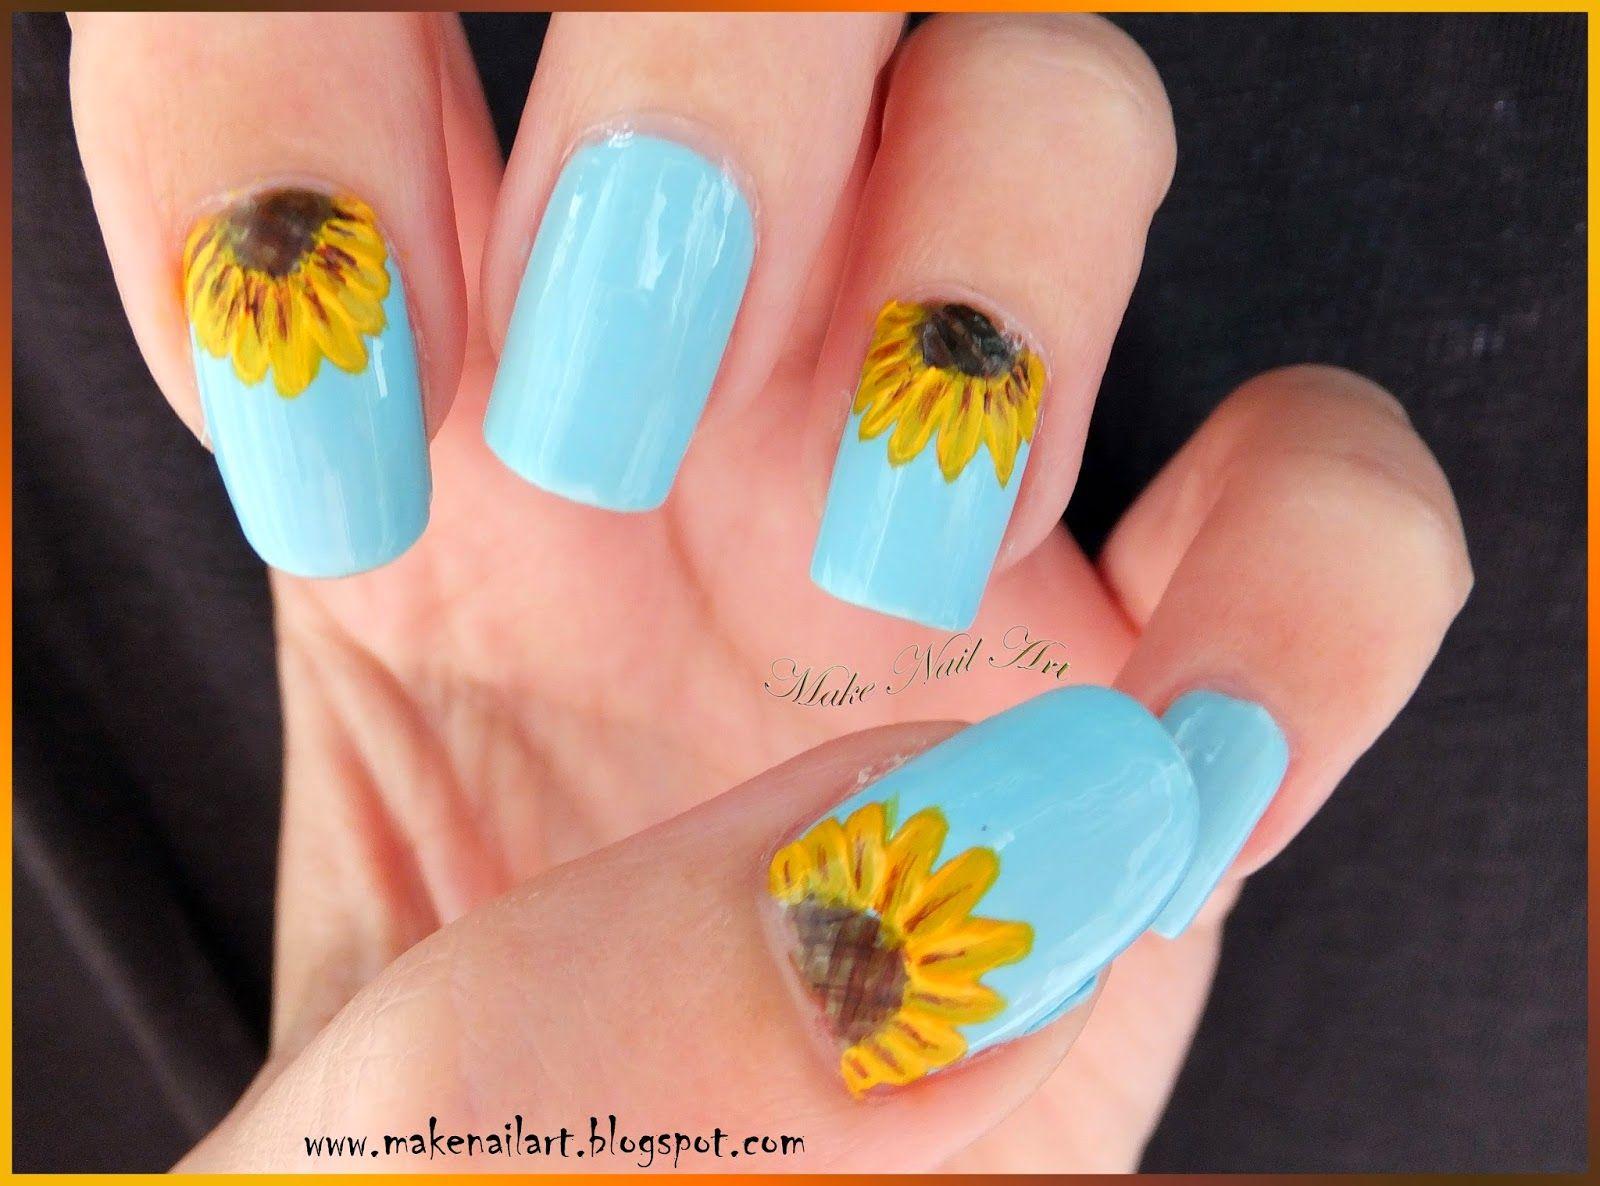 Make Nail Art: Sunflower Nail Art Tutorial - Nails Gelysh   Pinterest